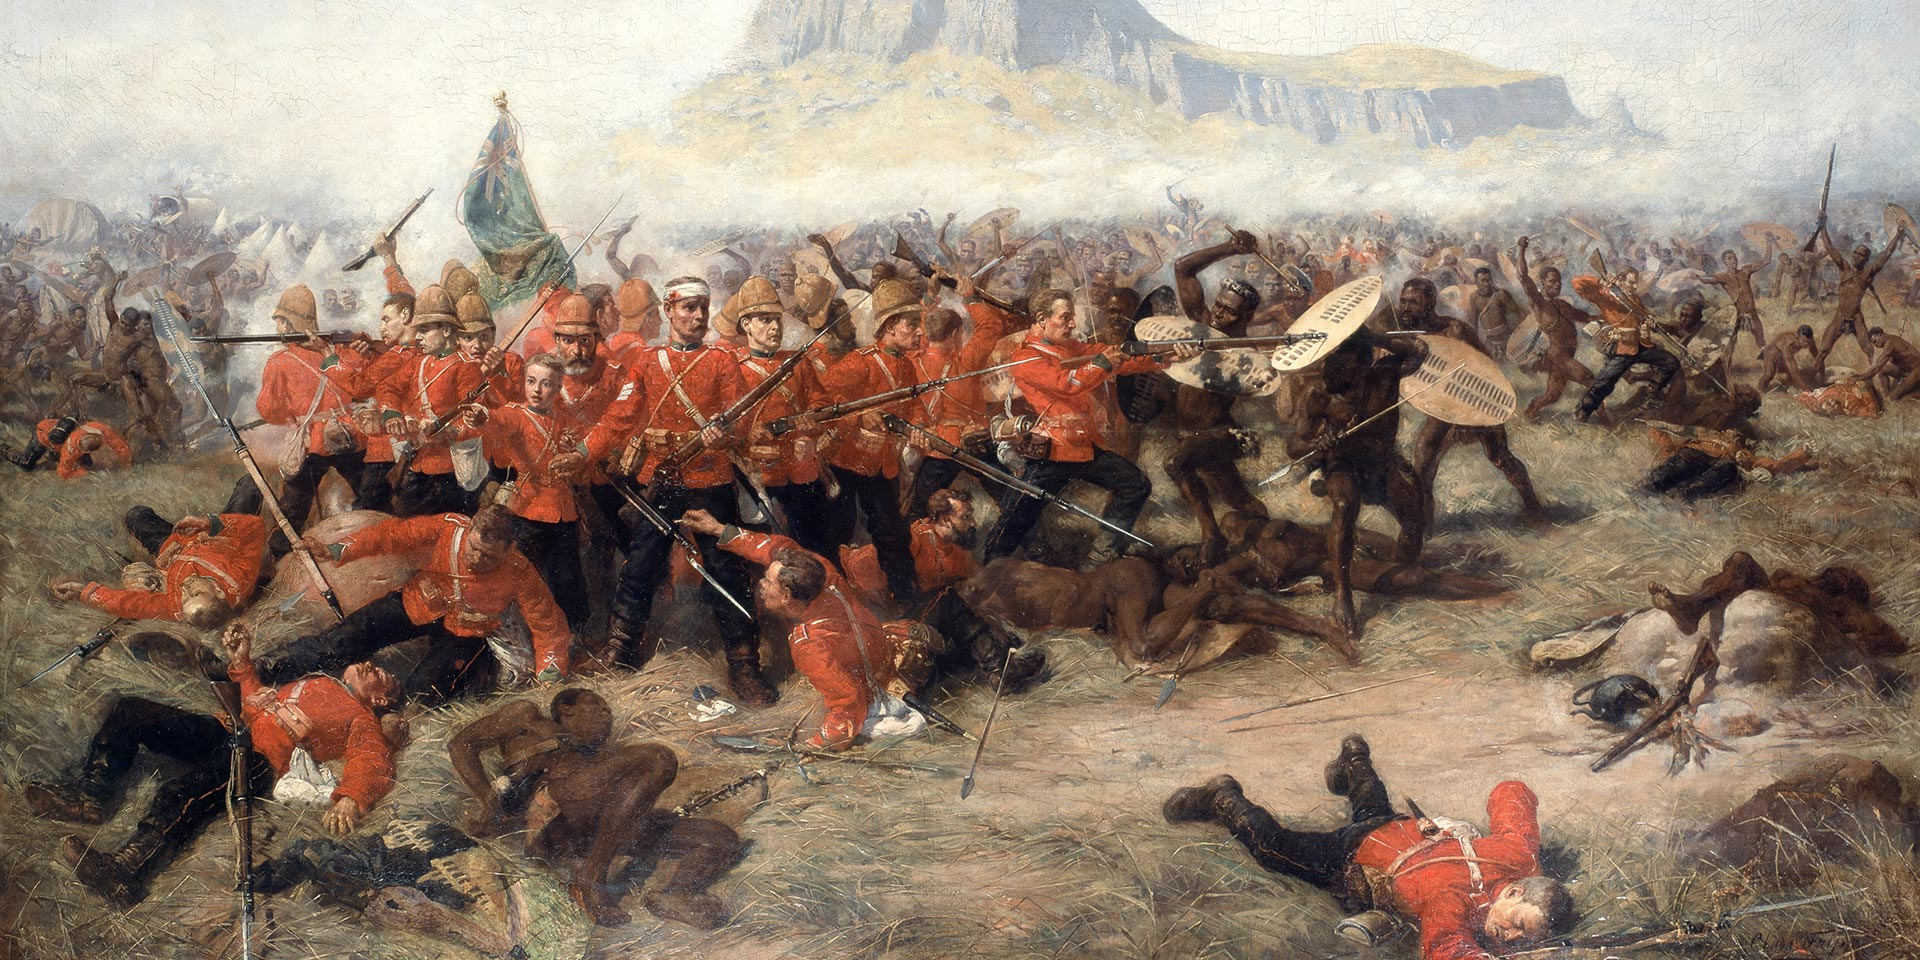 The Battle of Isandlawana by Charles Edwin Fripp, 1885